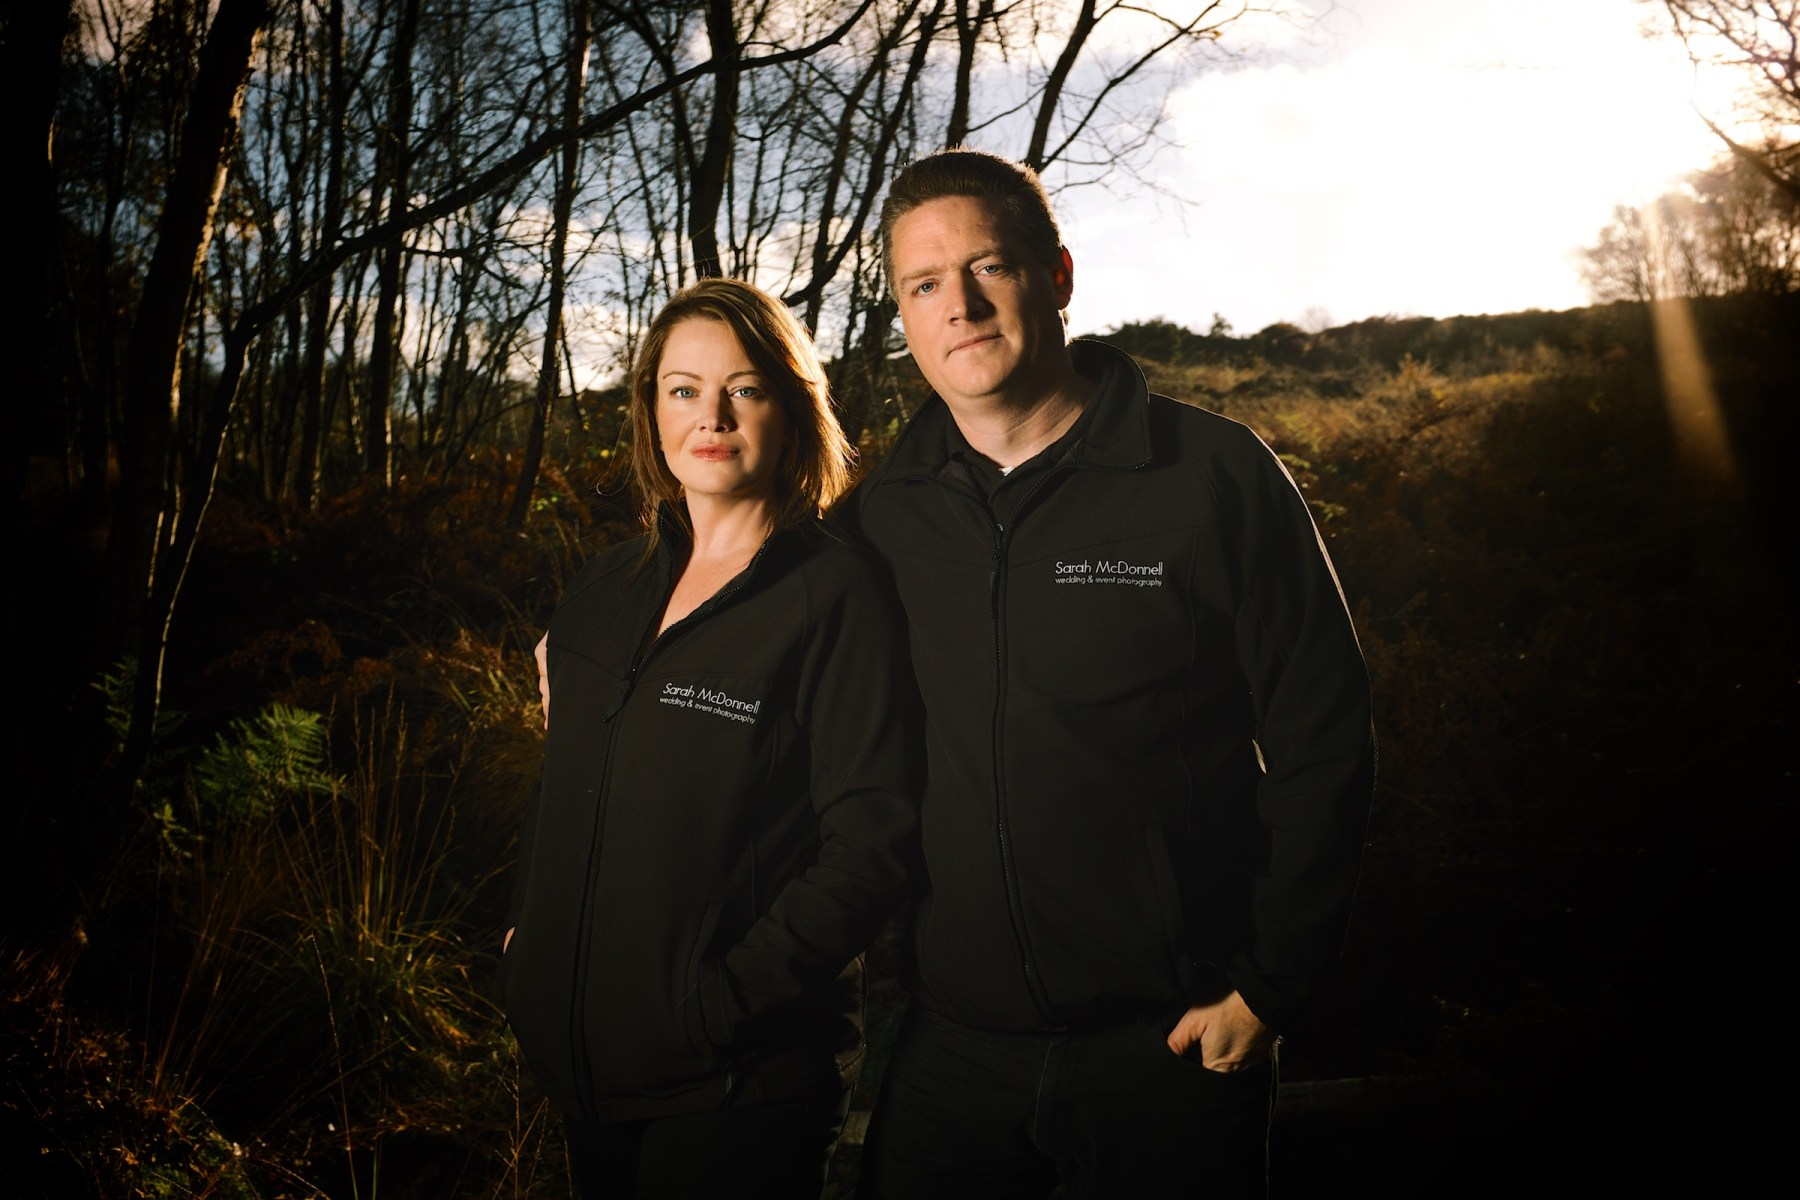 Wedding Videographer Cheshire - Sarah & Stuart profile image